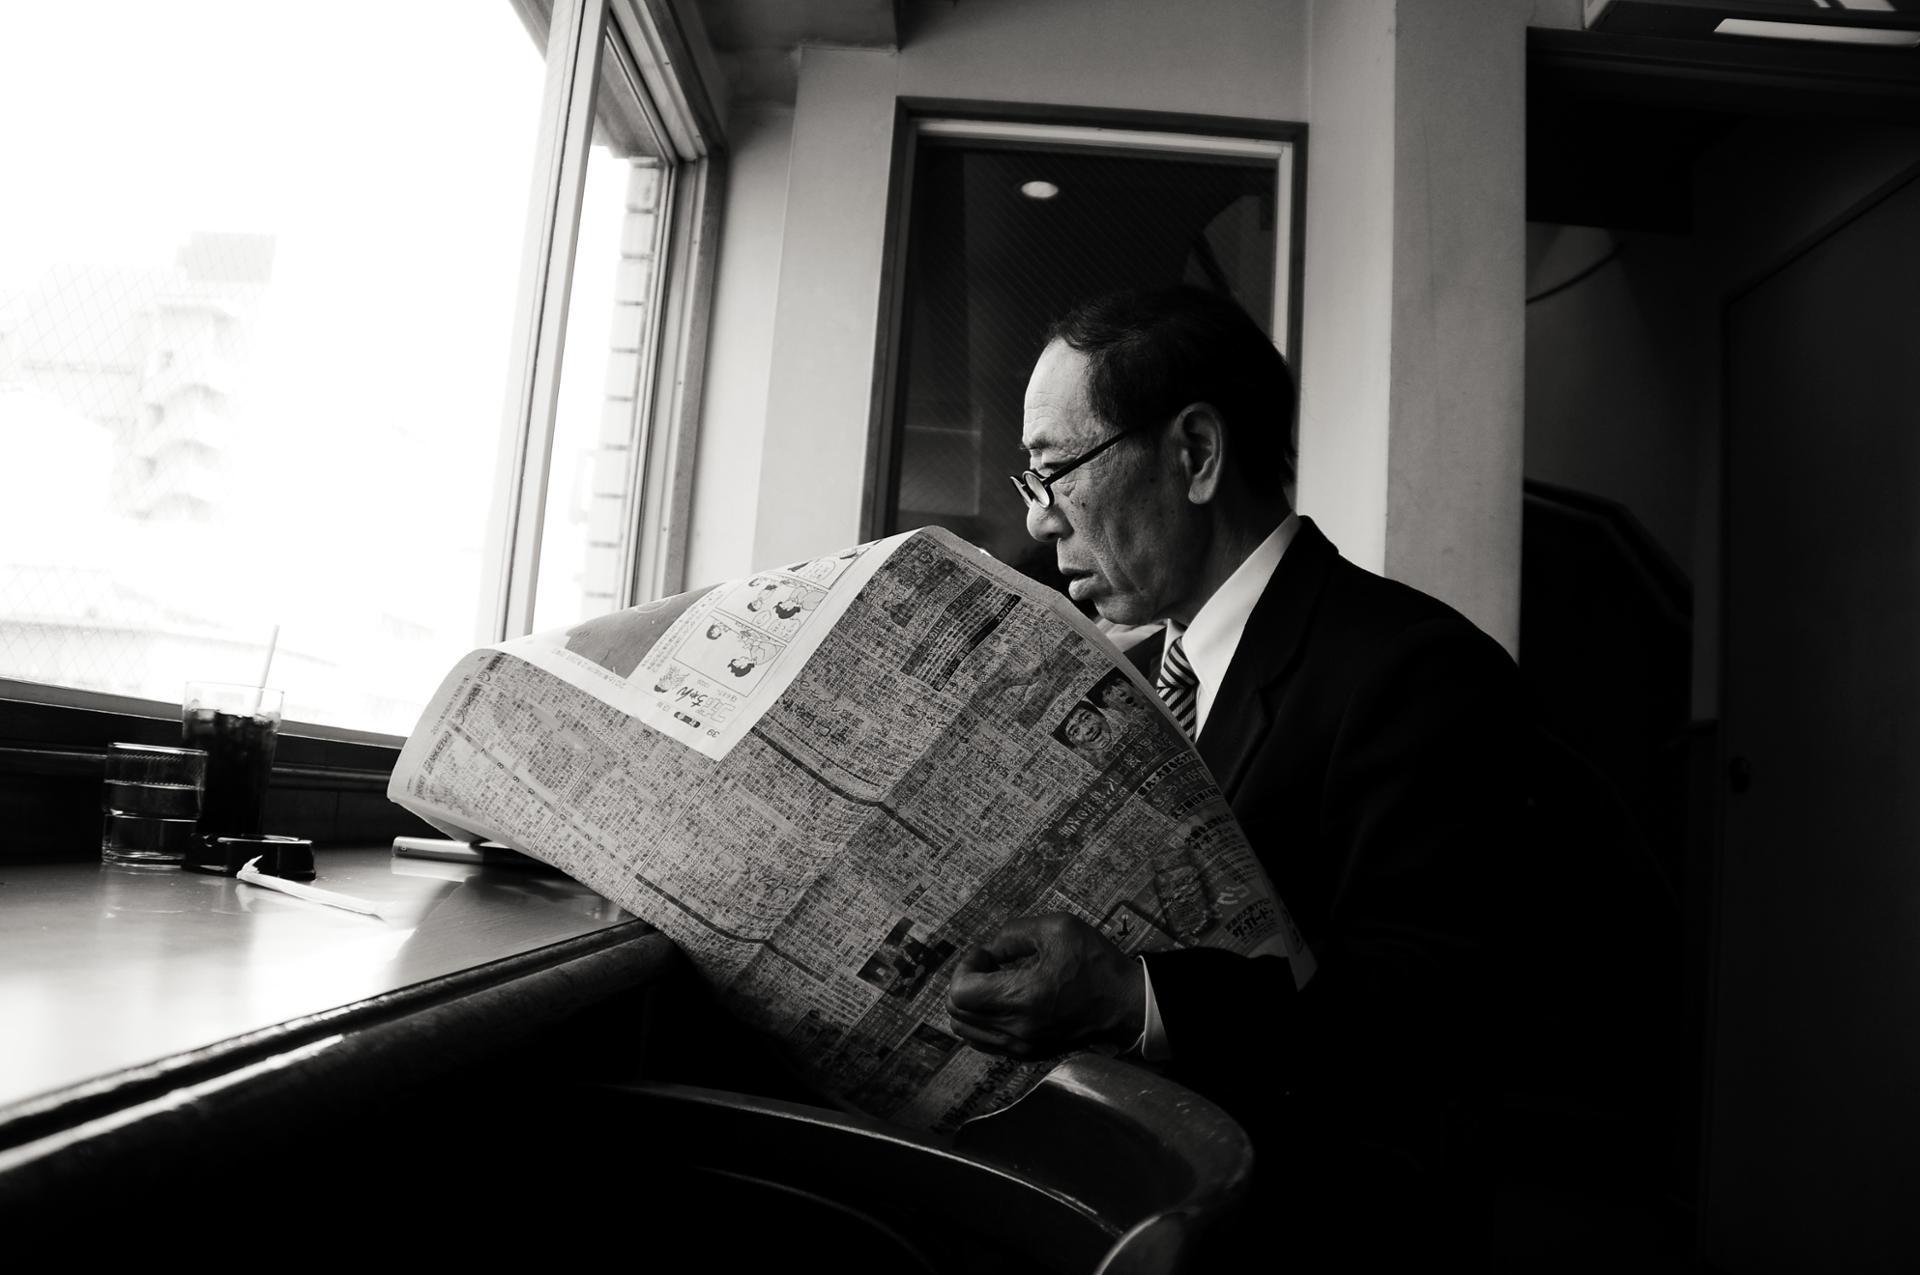 One Japanese Newspaper reader